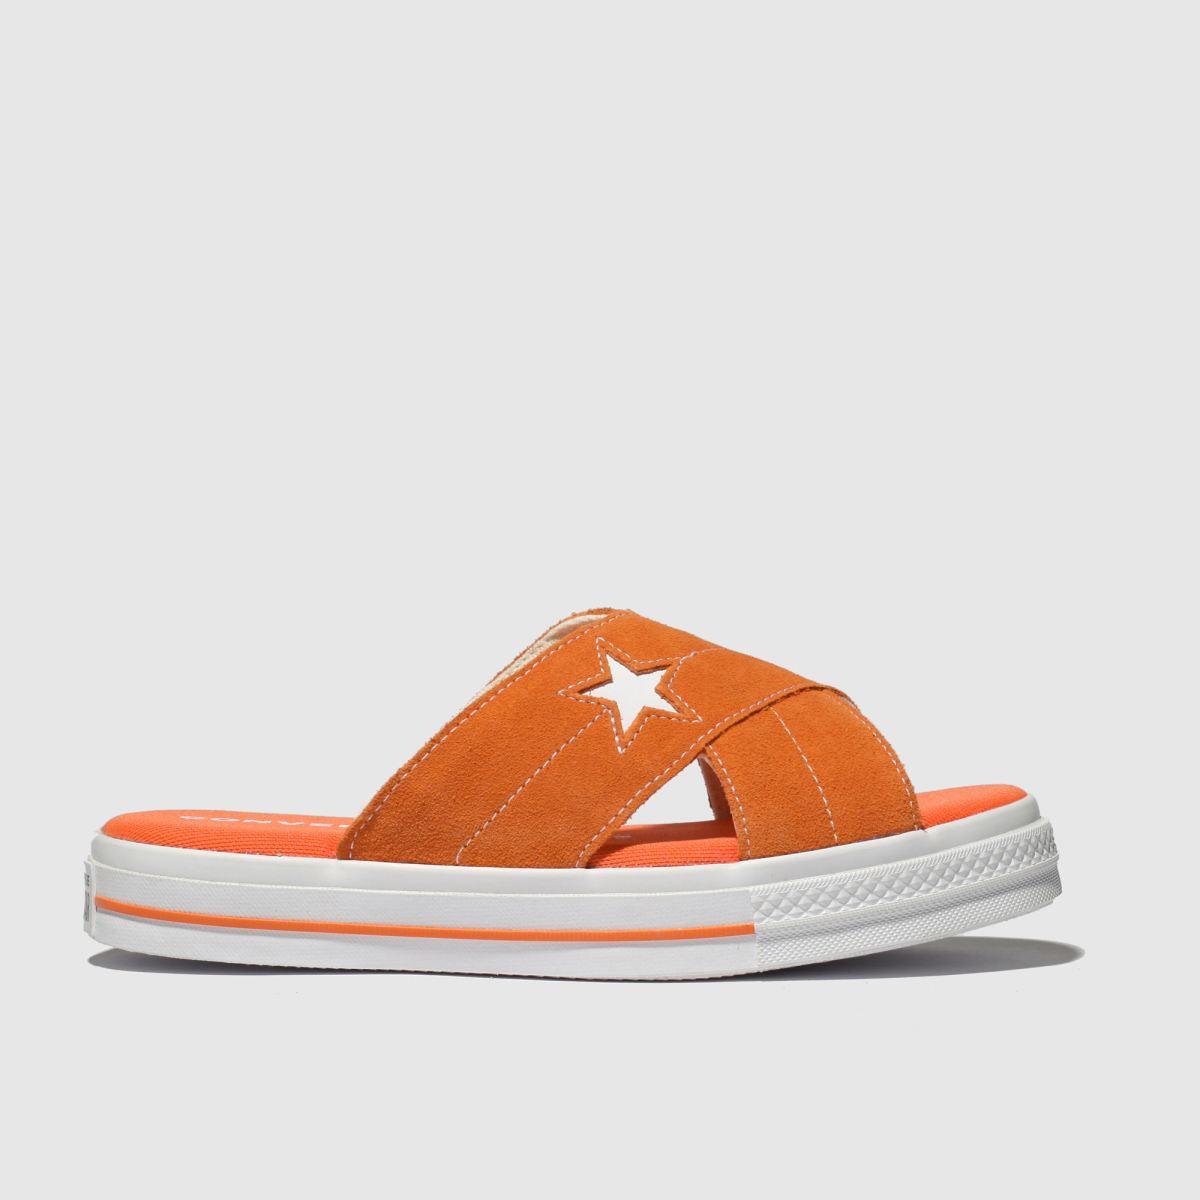 Converse Orange One Star Sandal Sandals